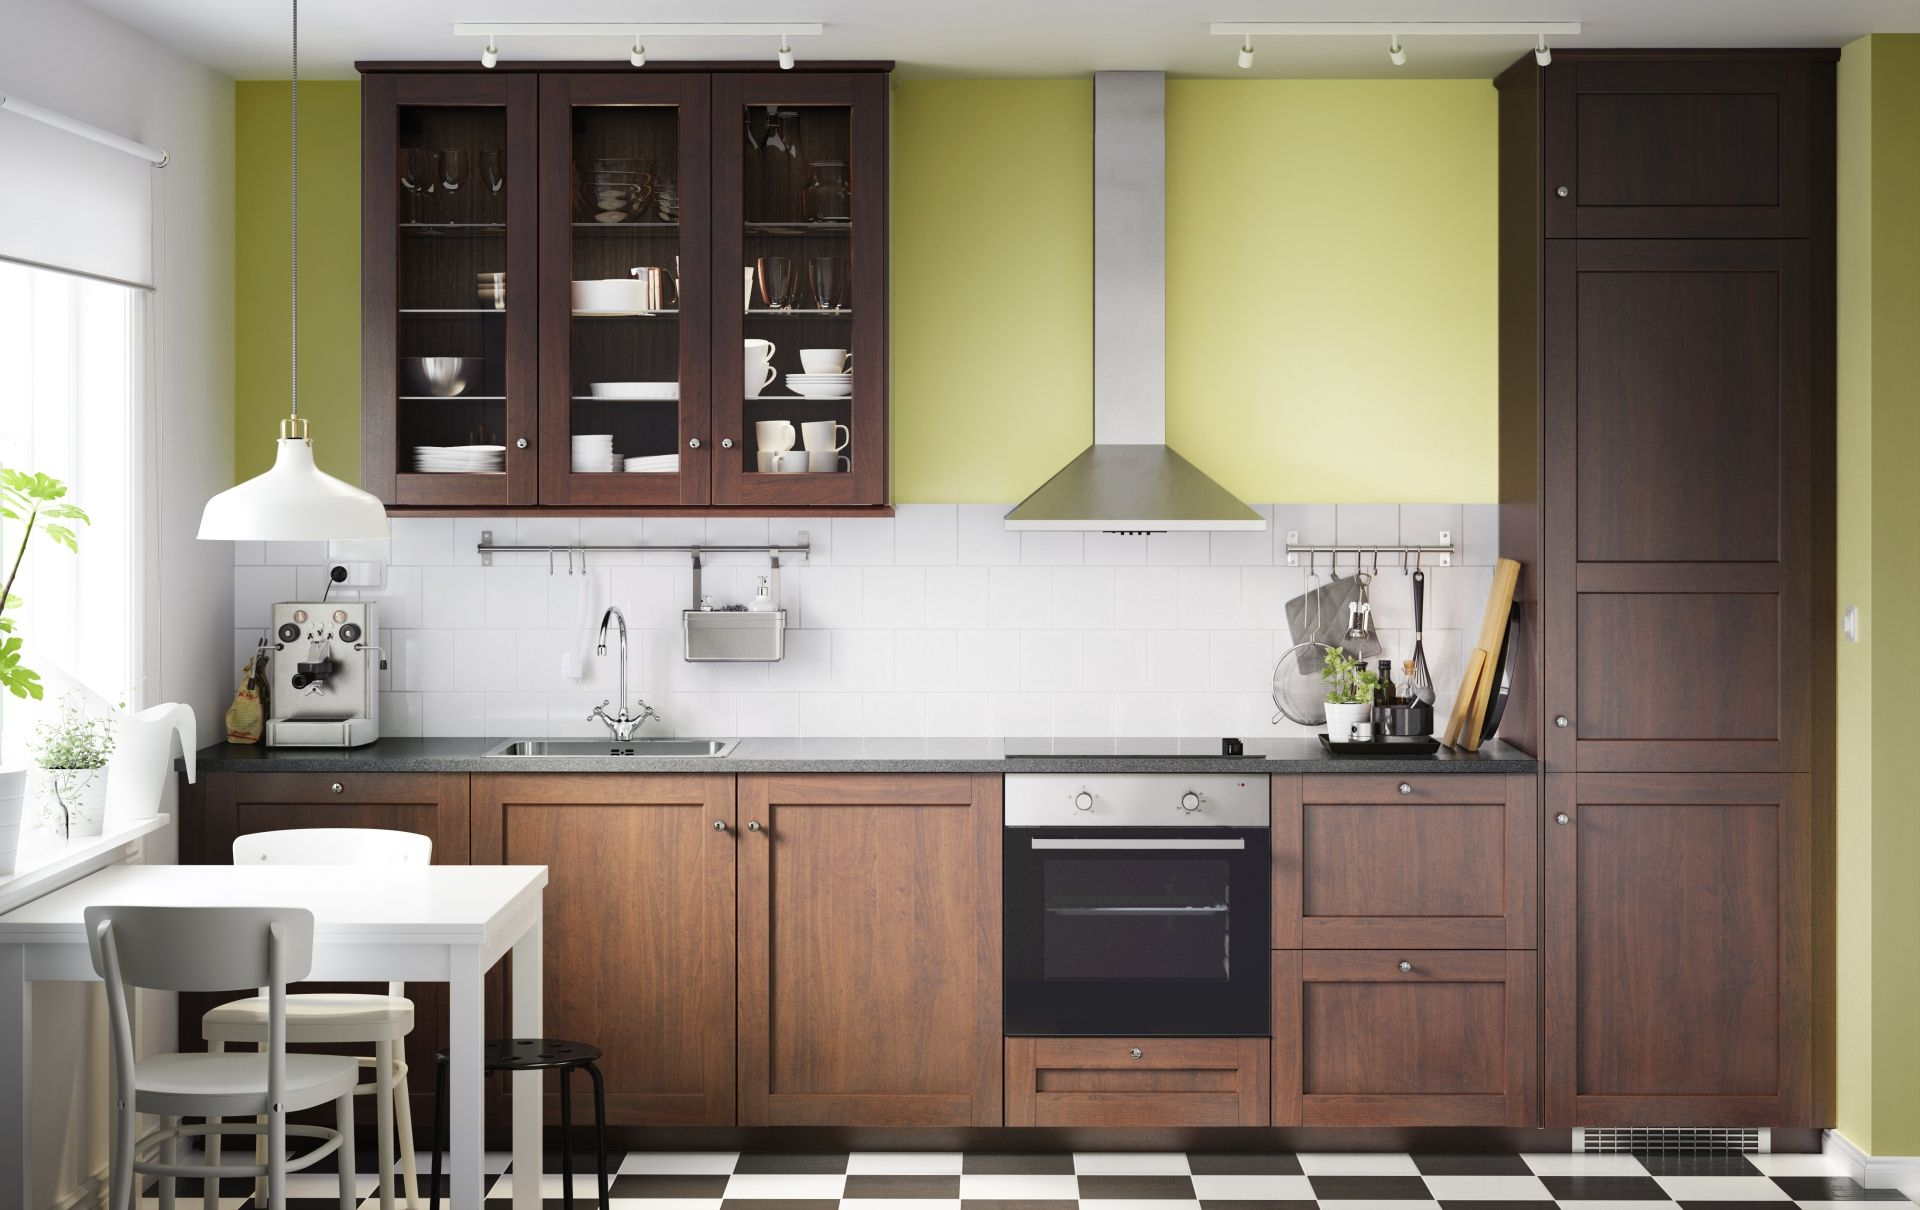 Opbergers Ikea Keuken : Edserum deur ikea ikeanl ikeanederland keuken metod serie